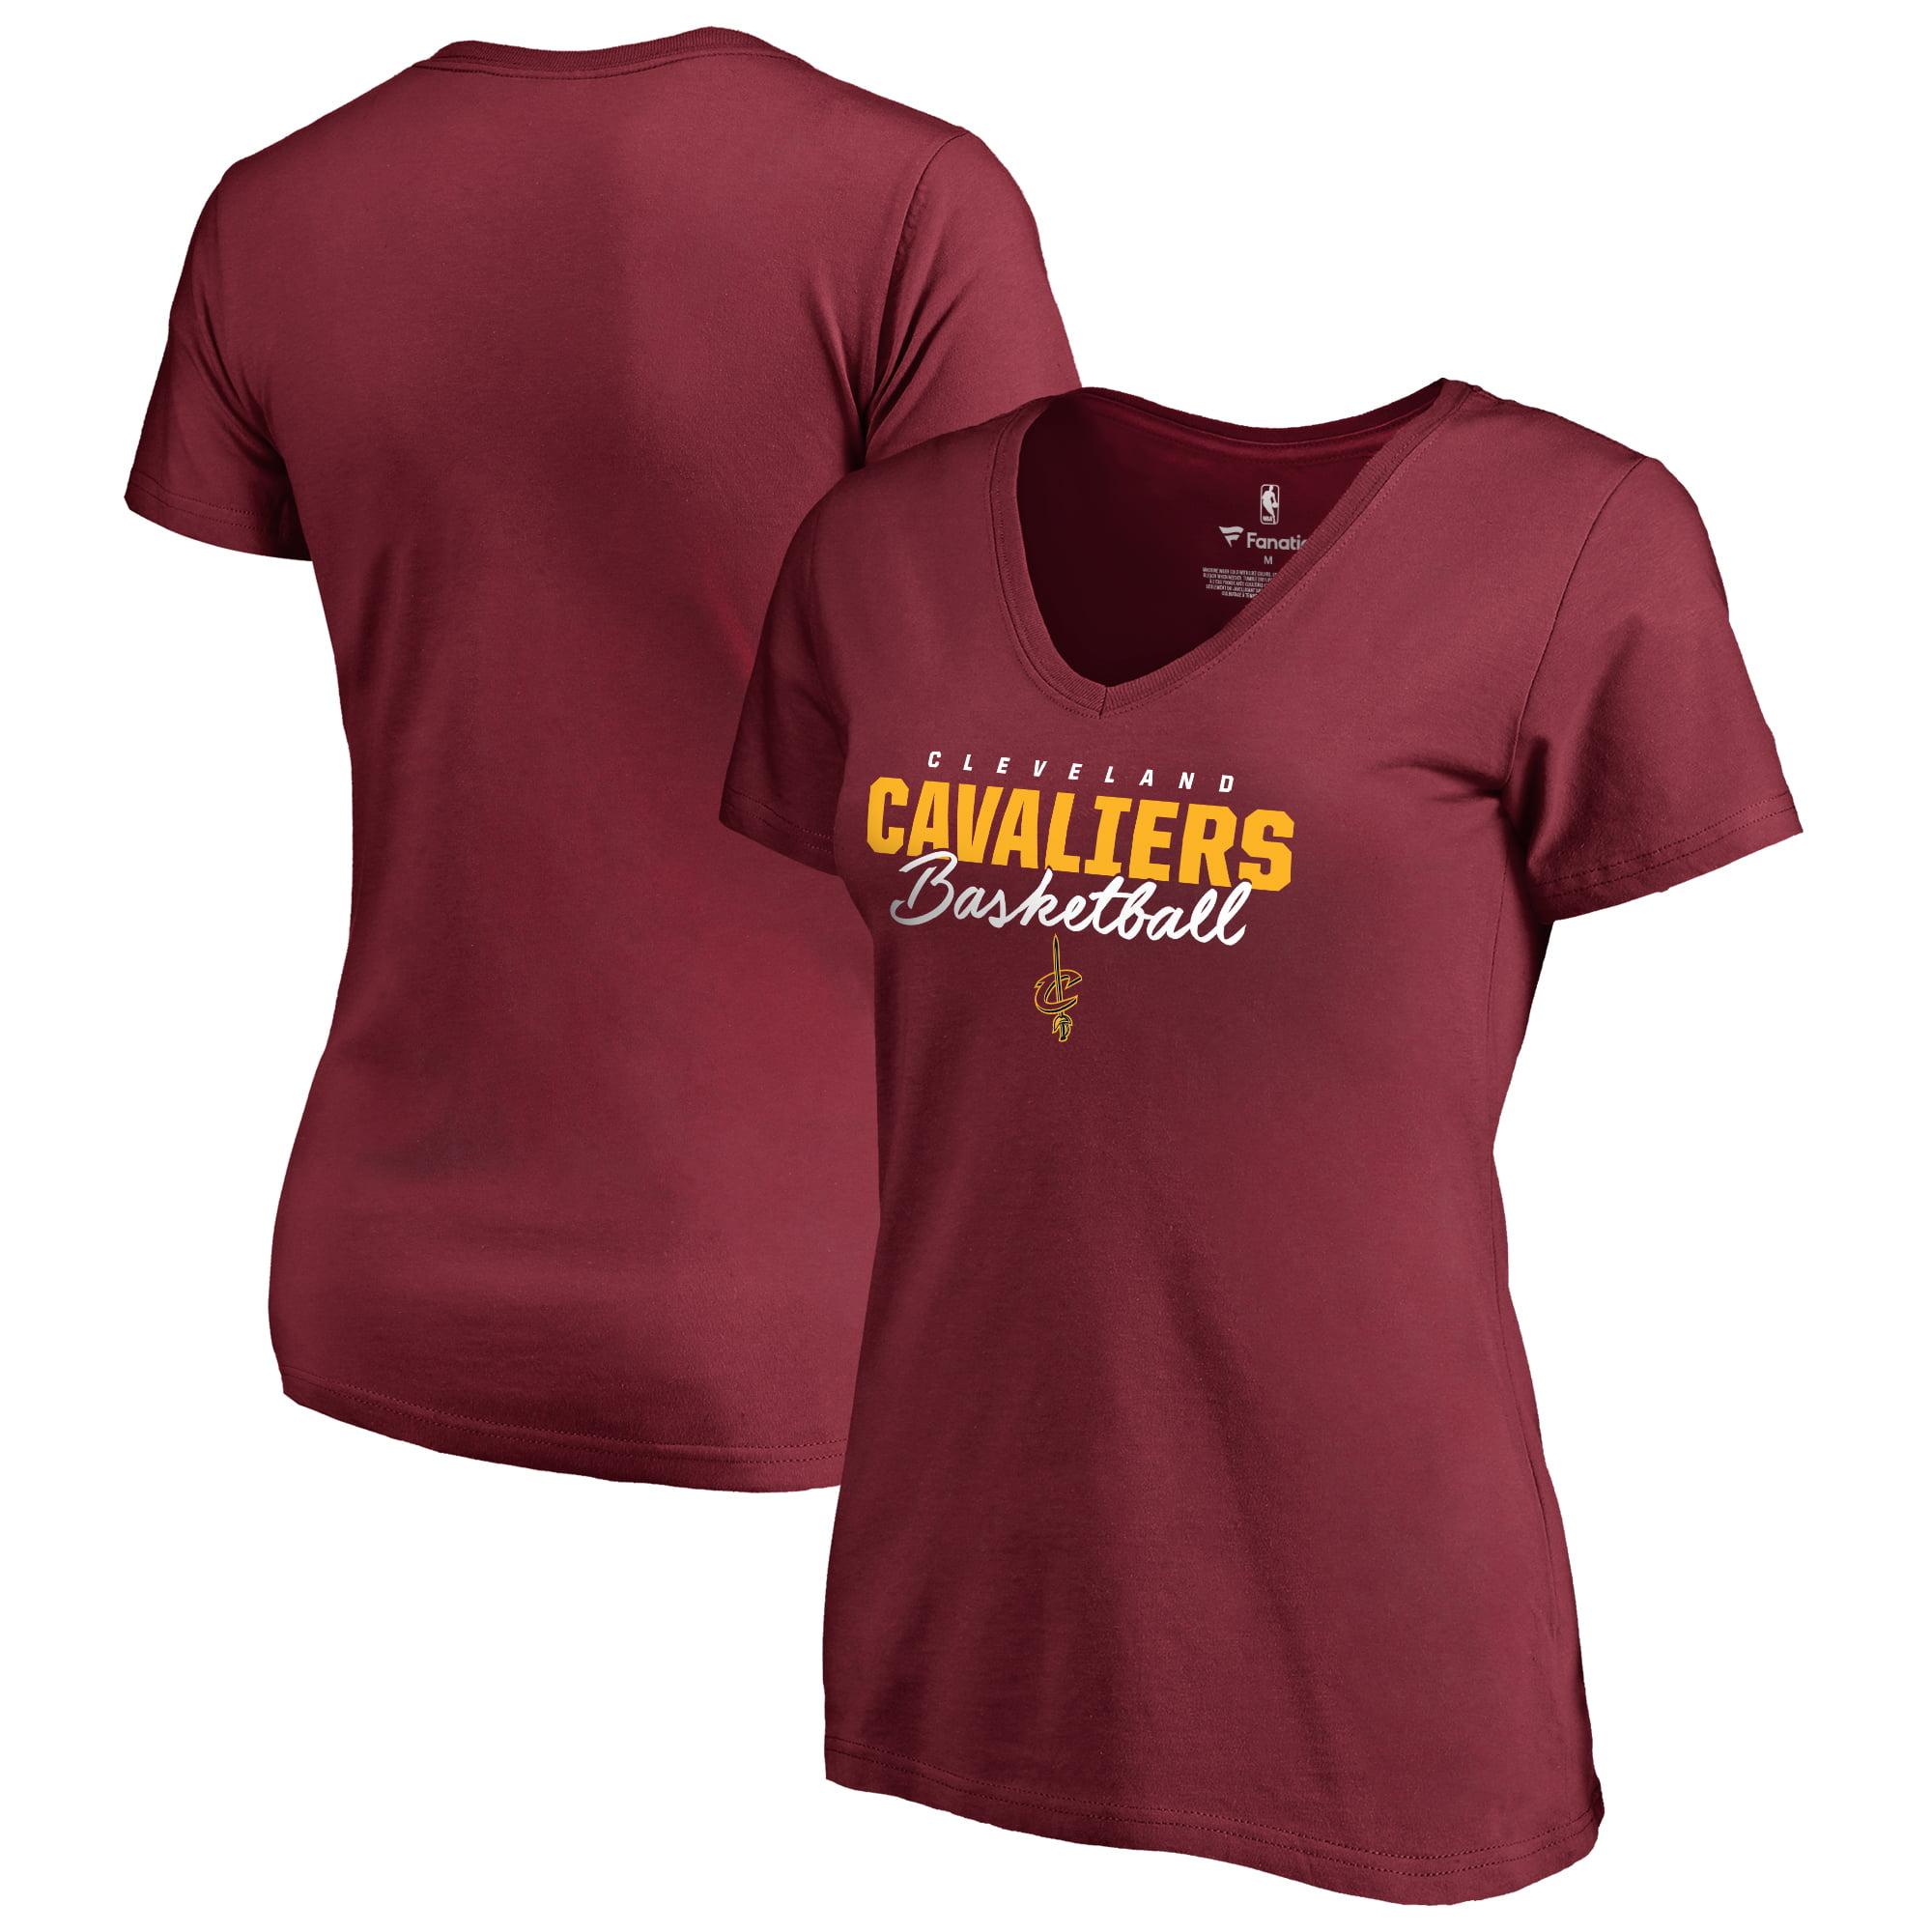 Cleveland Cavaliers Fanatics Branded Women's Script Assist T-Shirt - Wine